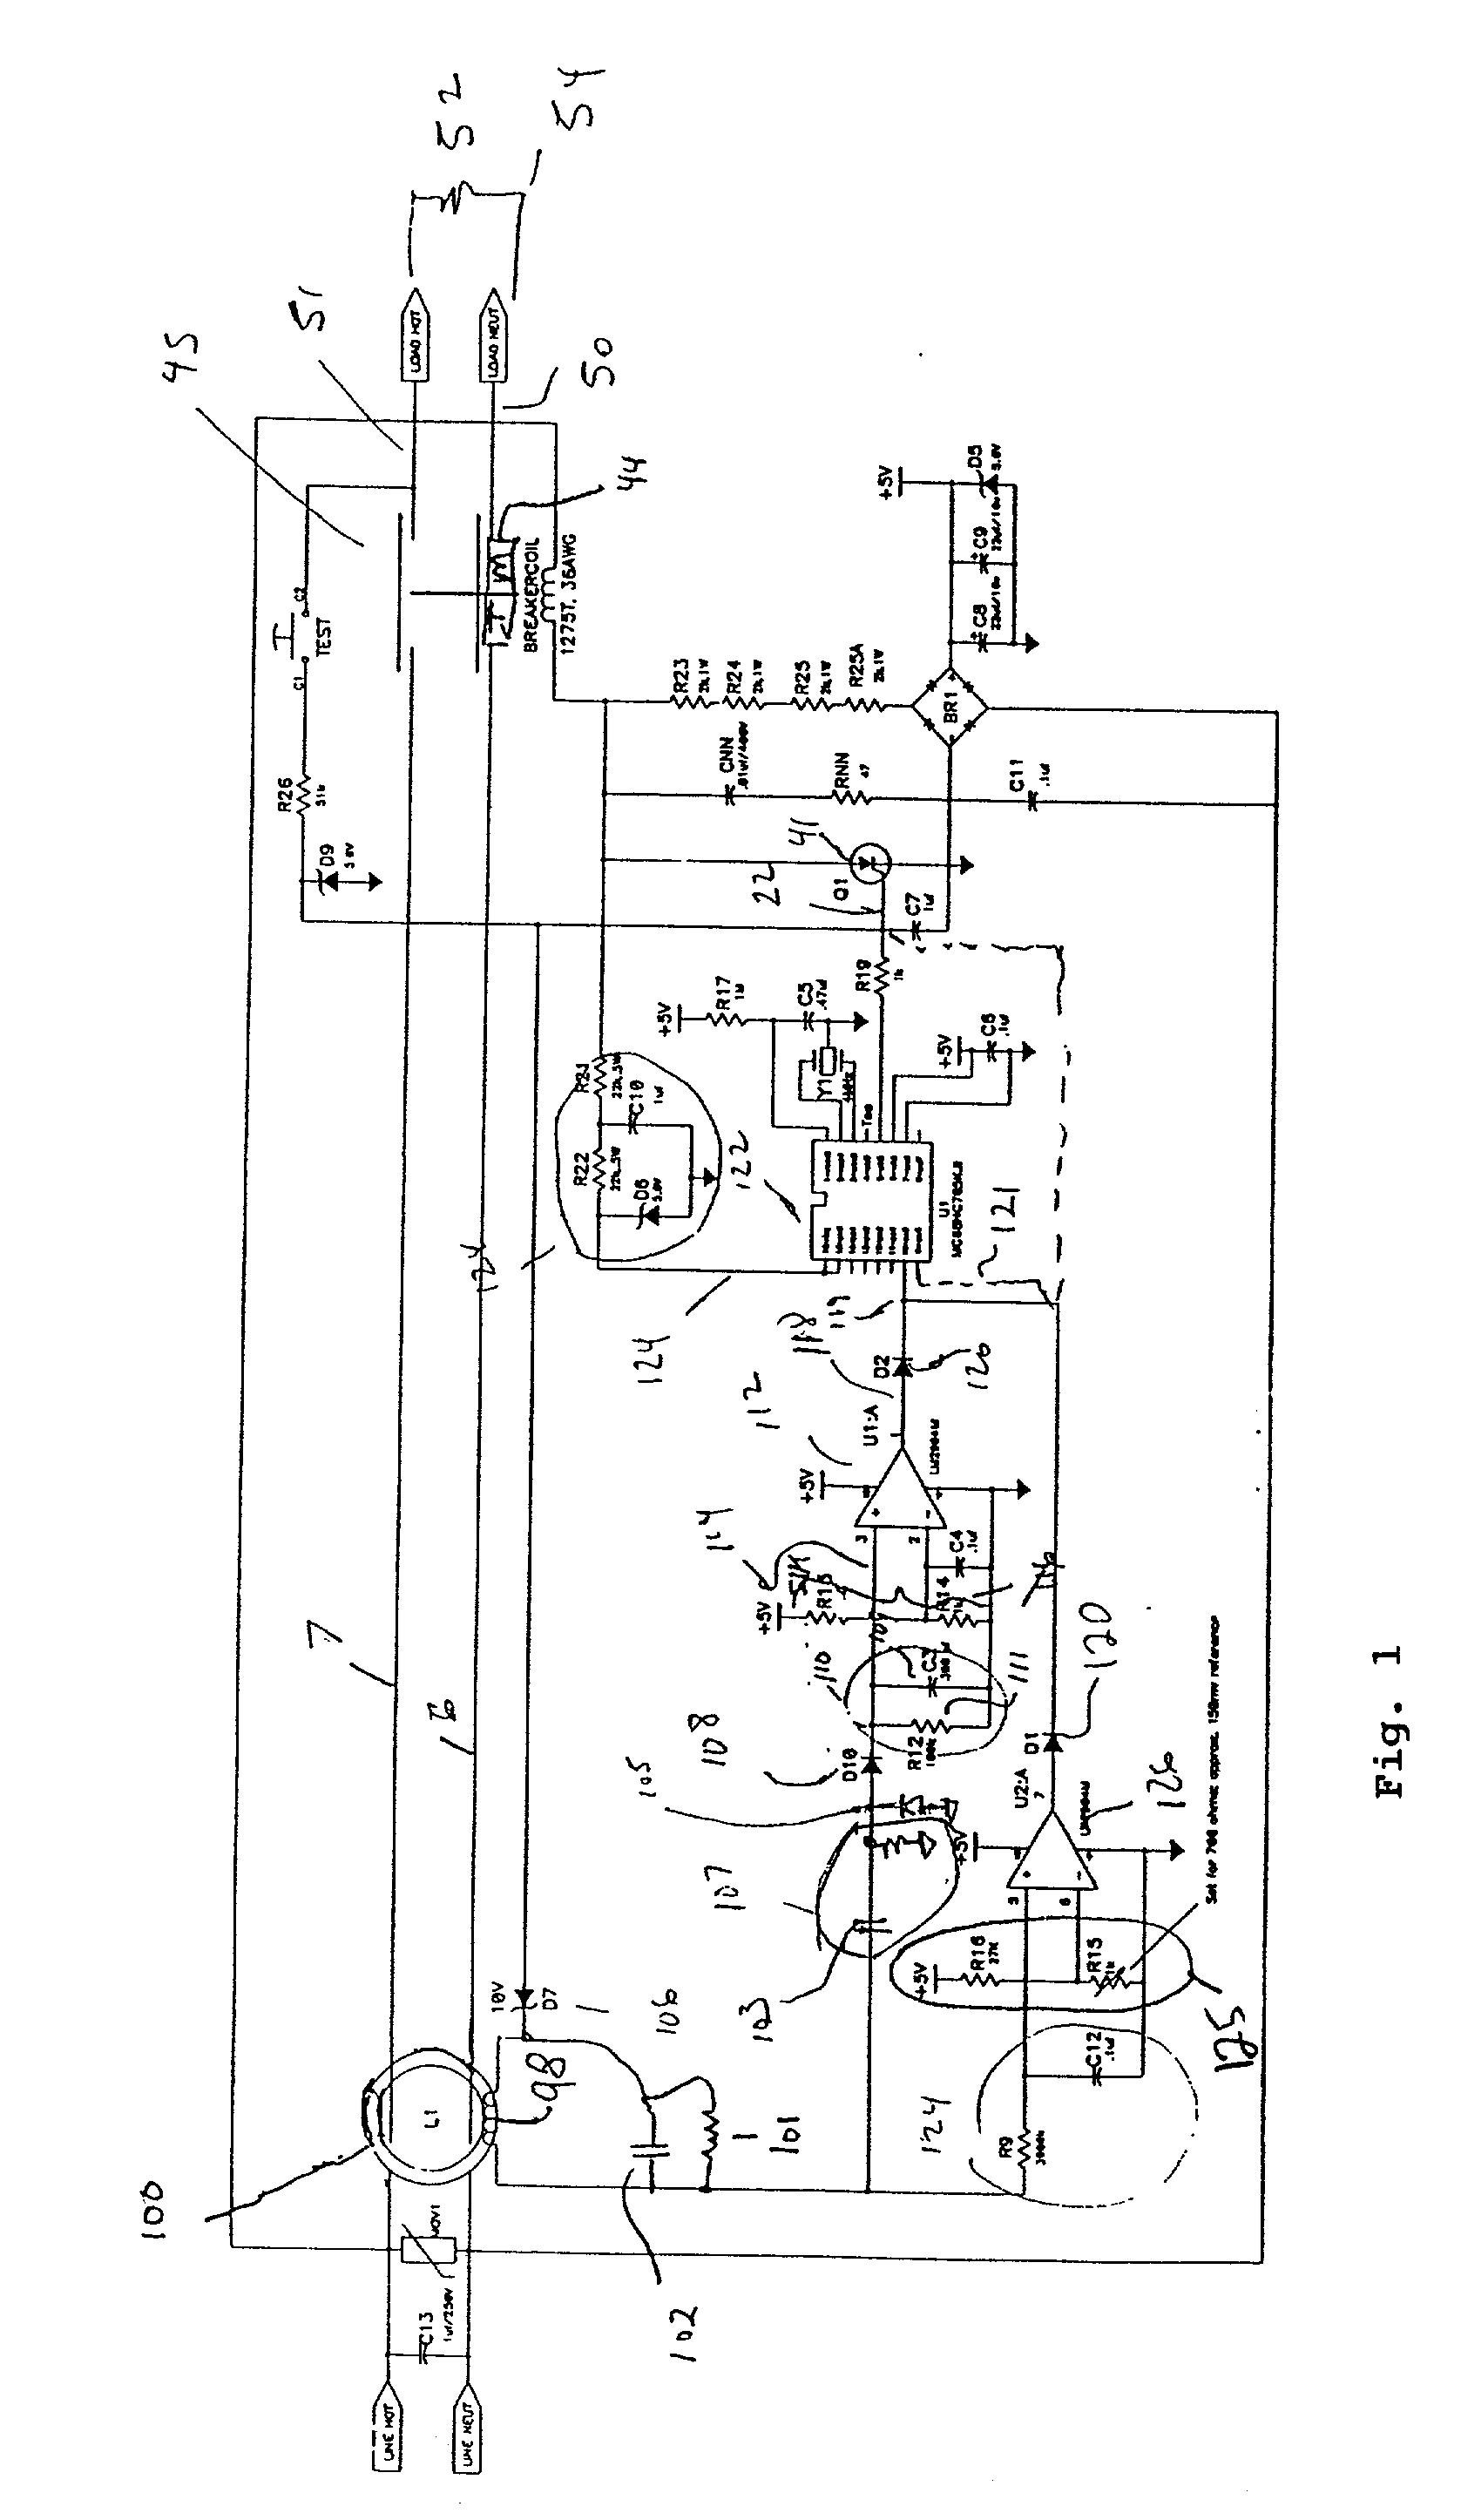 wiring diagram colorspower grnd leftrt speakers etcfor a jensen